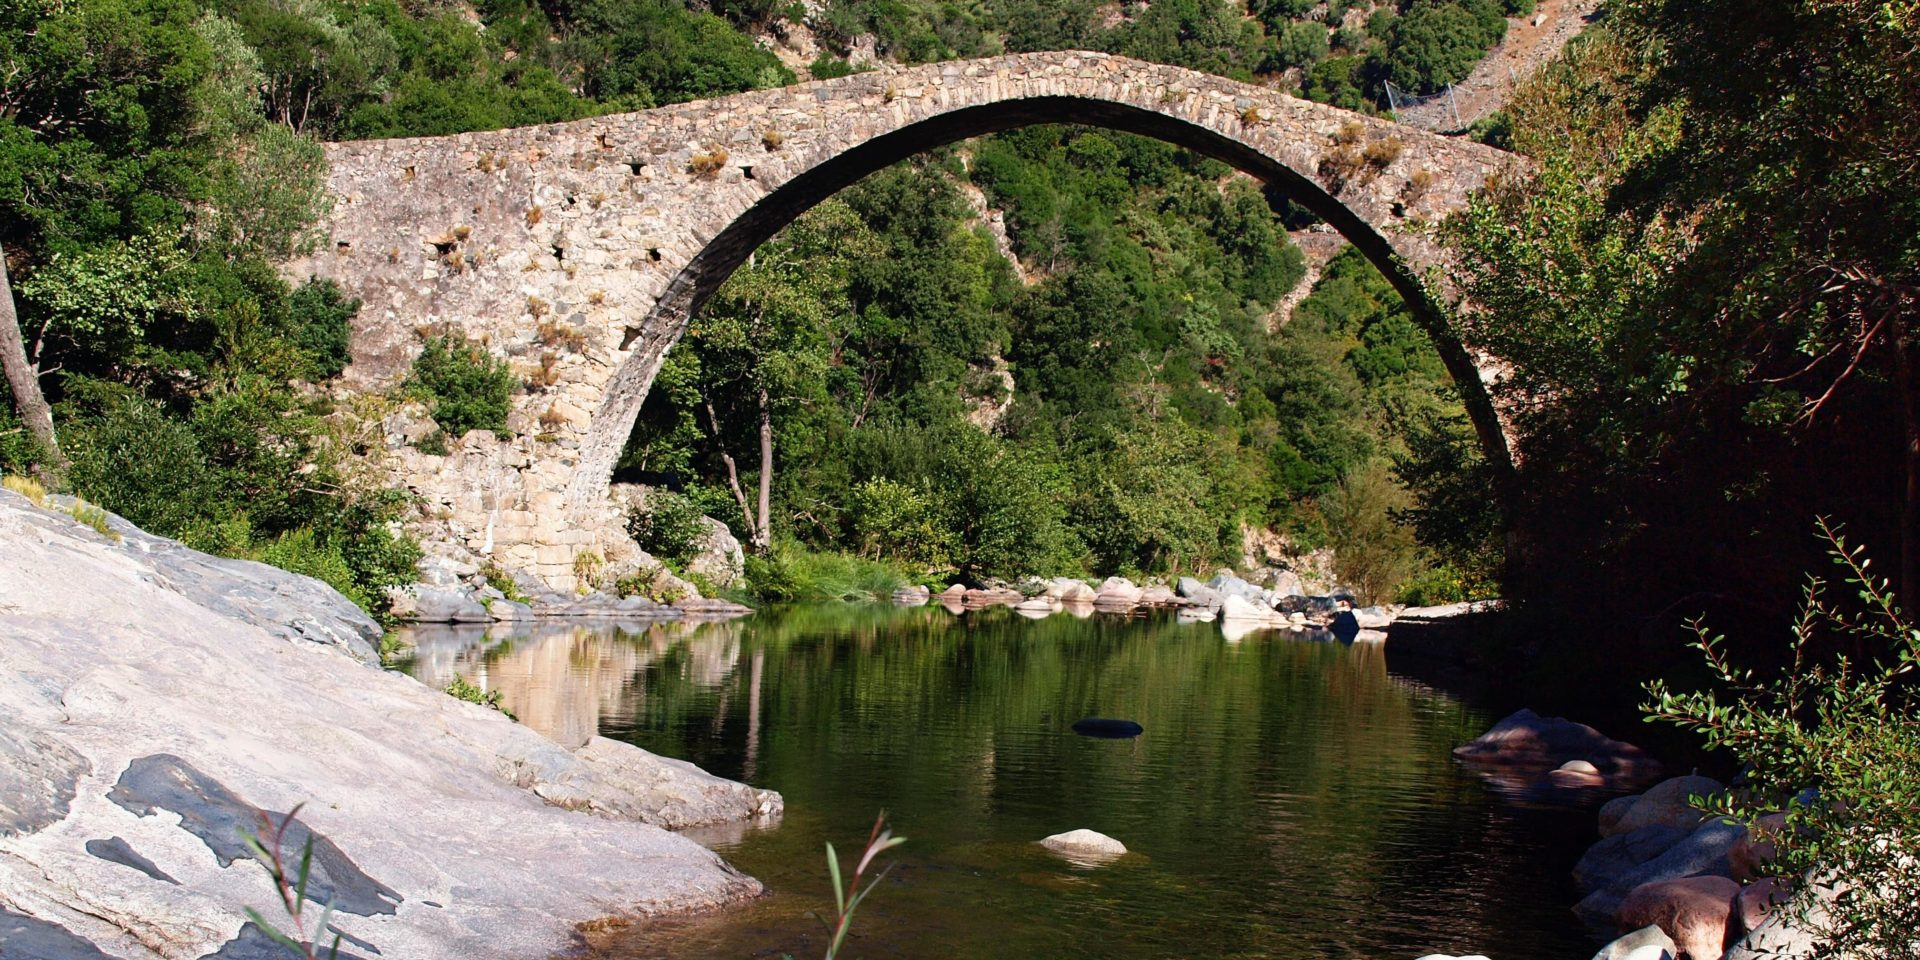 Gorges de la Spelunca Ota Pont de Pianella Corsica Frankrijk Genuese brug water